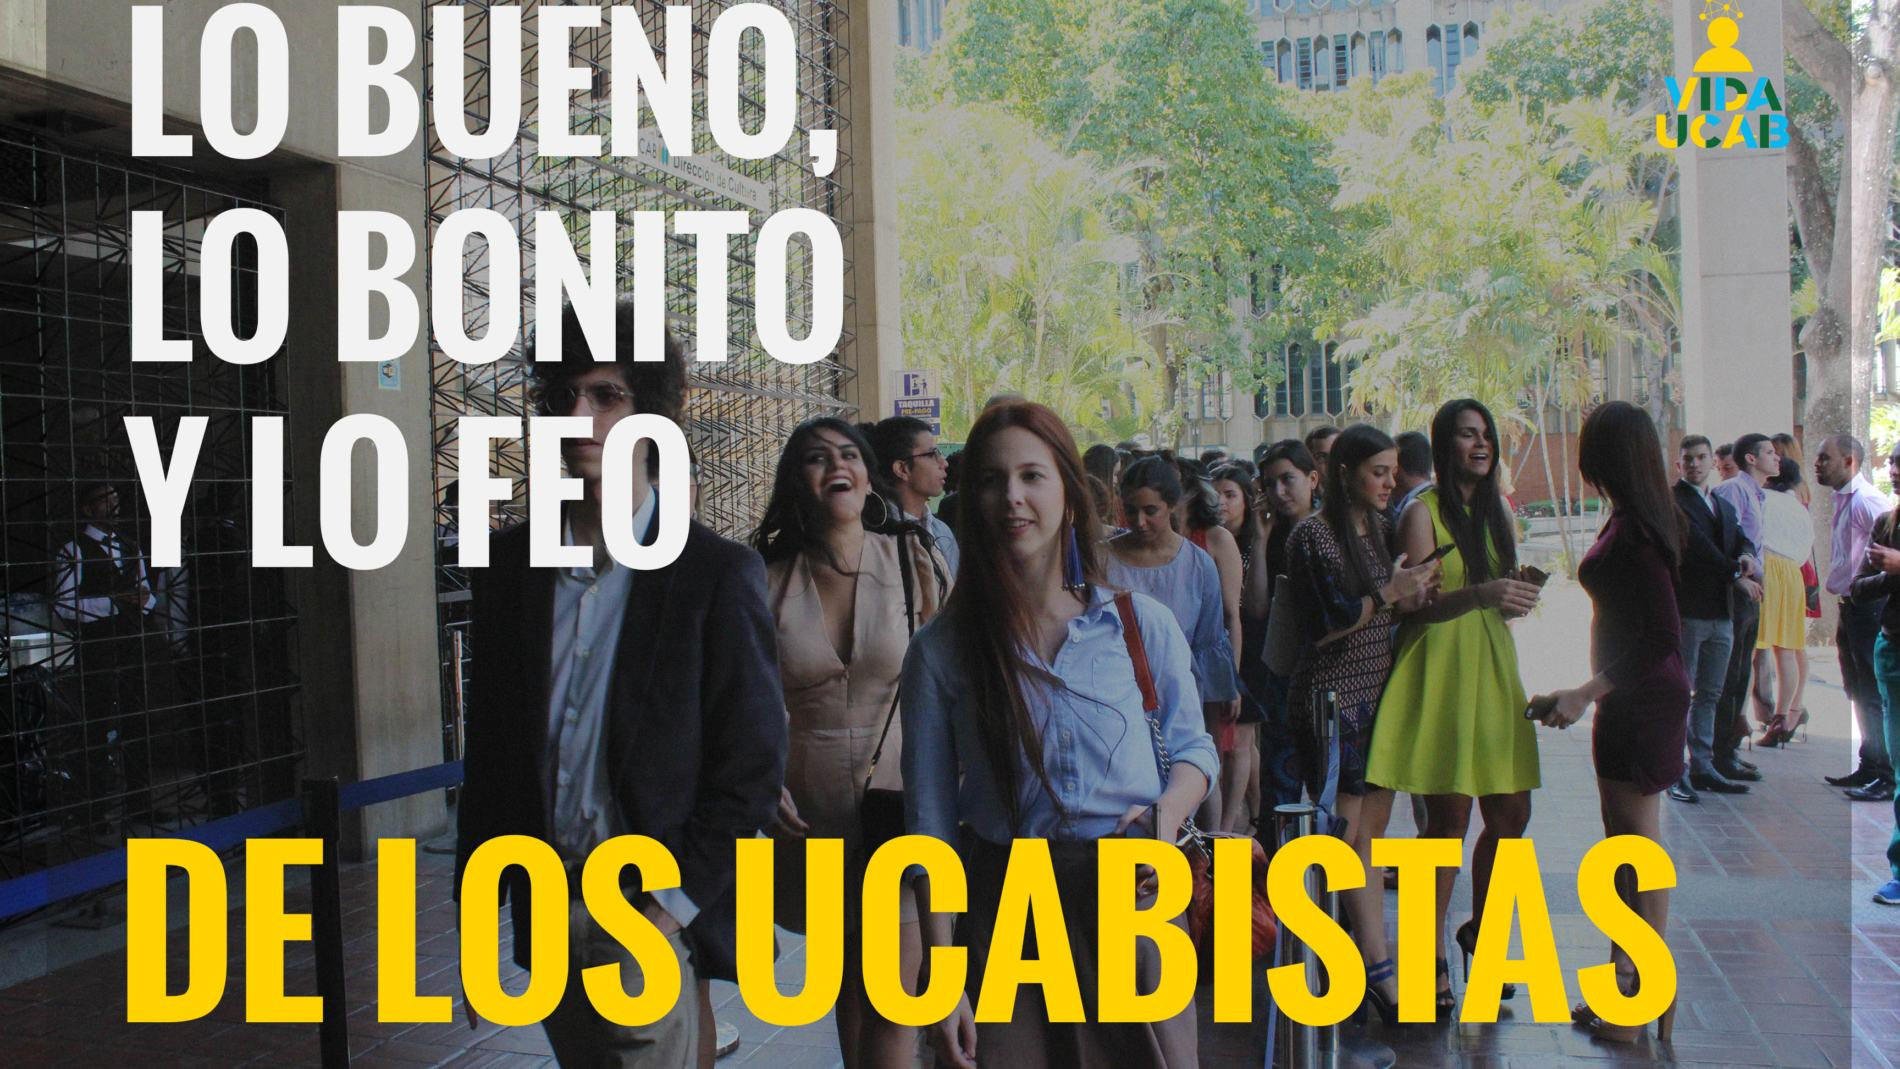 UCABISTAS-min